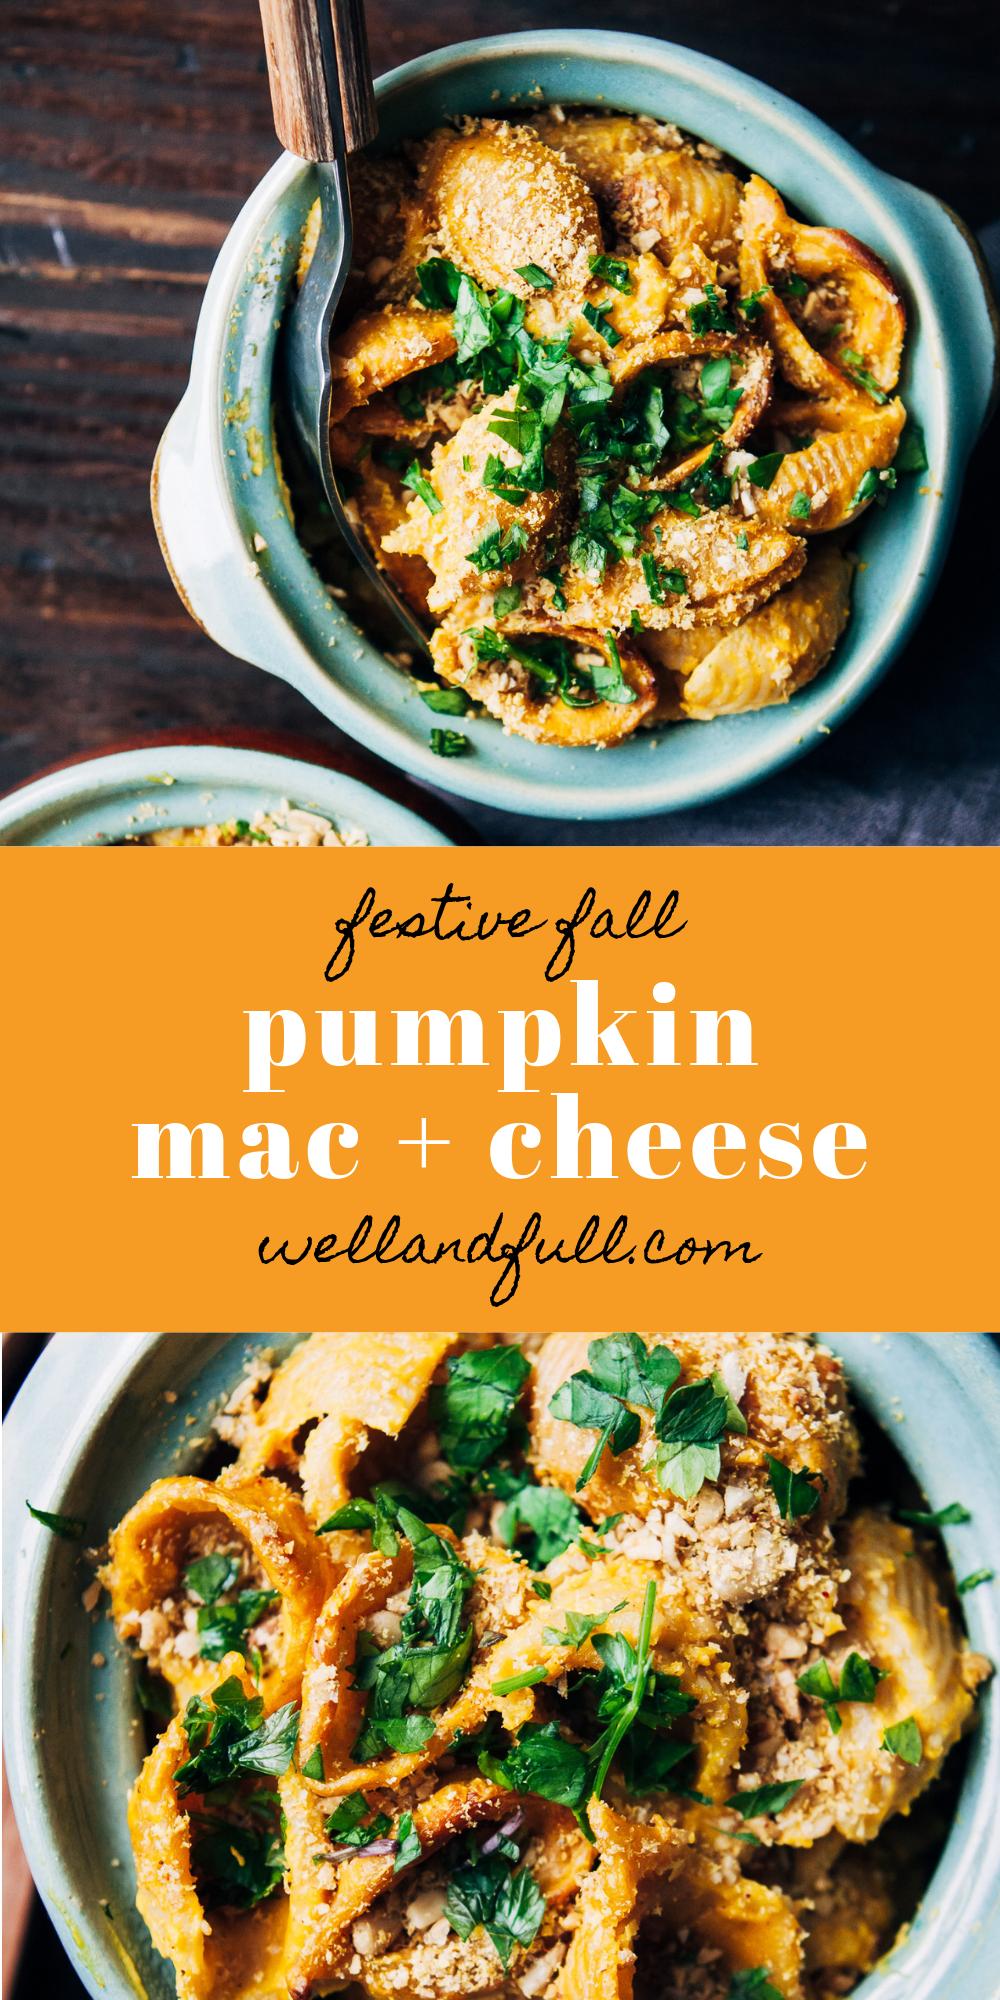 Vegan Pumpkin Mac And Cheese Well And Full Recipe Autumn Recipes Vegetarian Vegan Pumpkin Fall Recipes Healthy